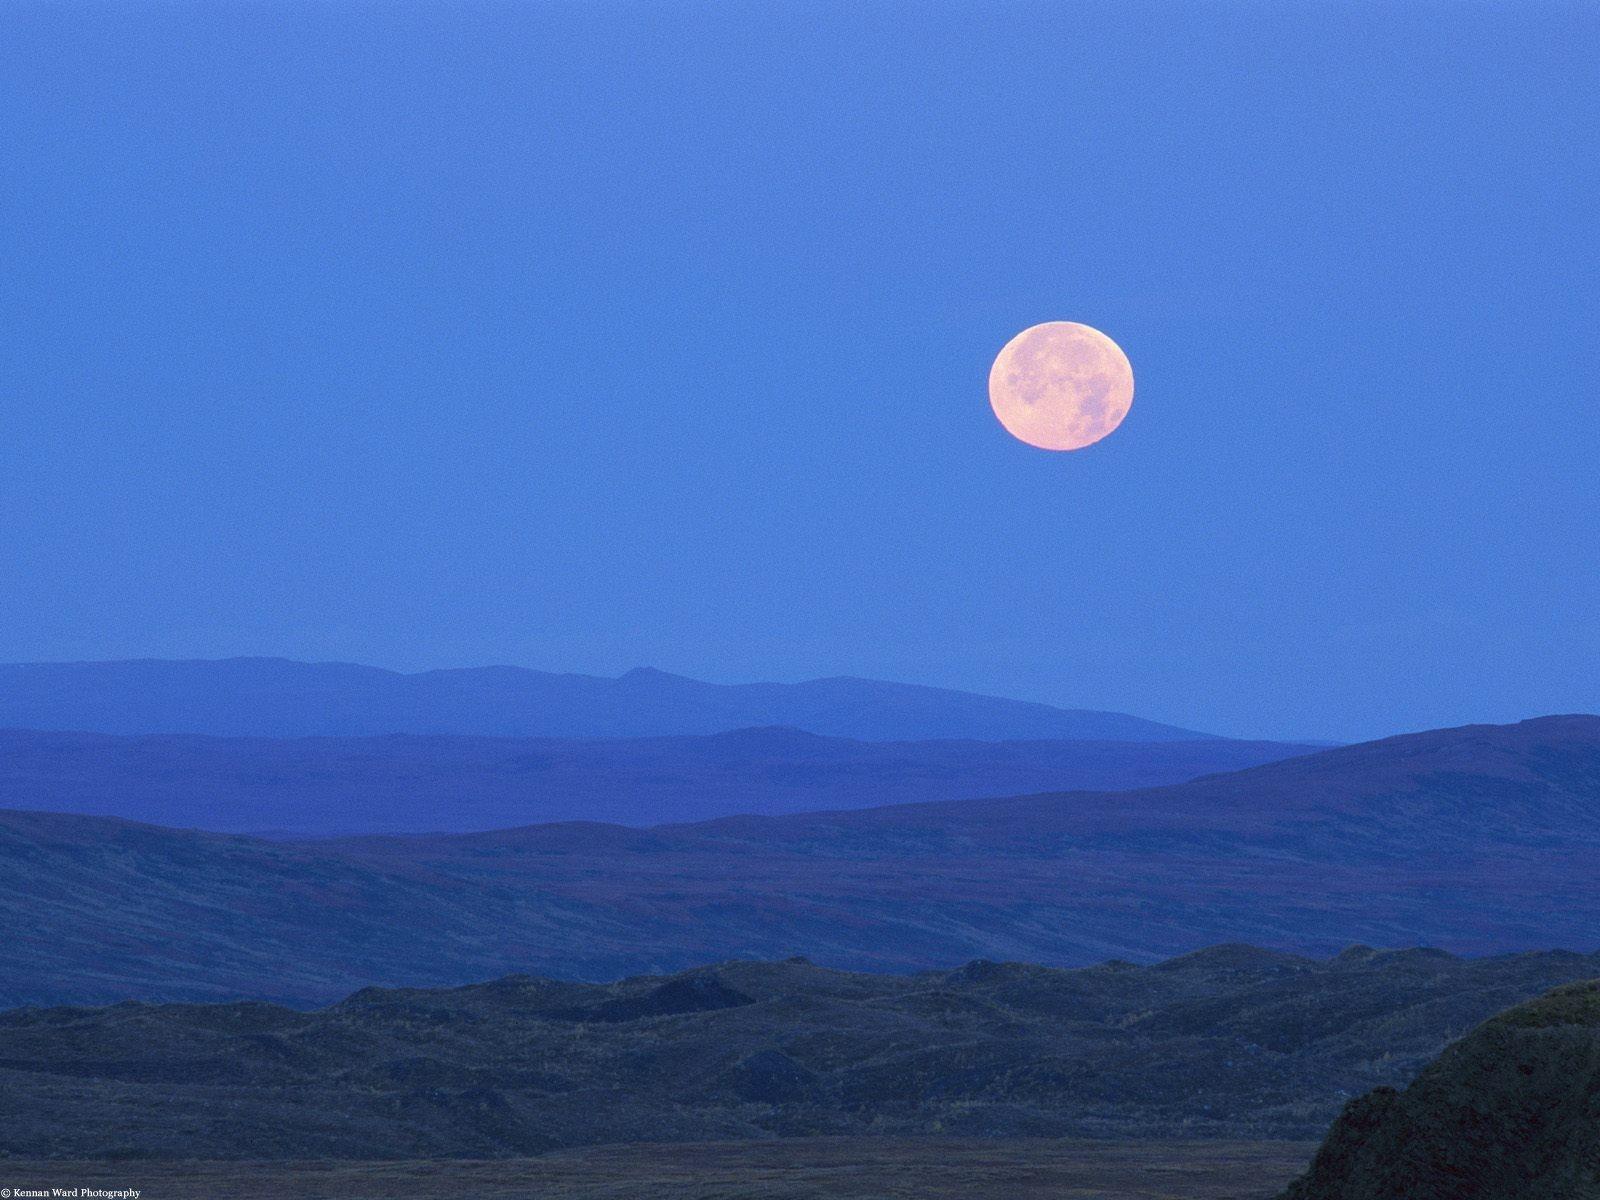 Alaska Full Moon night sky landscapes hills wallpaper background 1600x1200